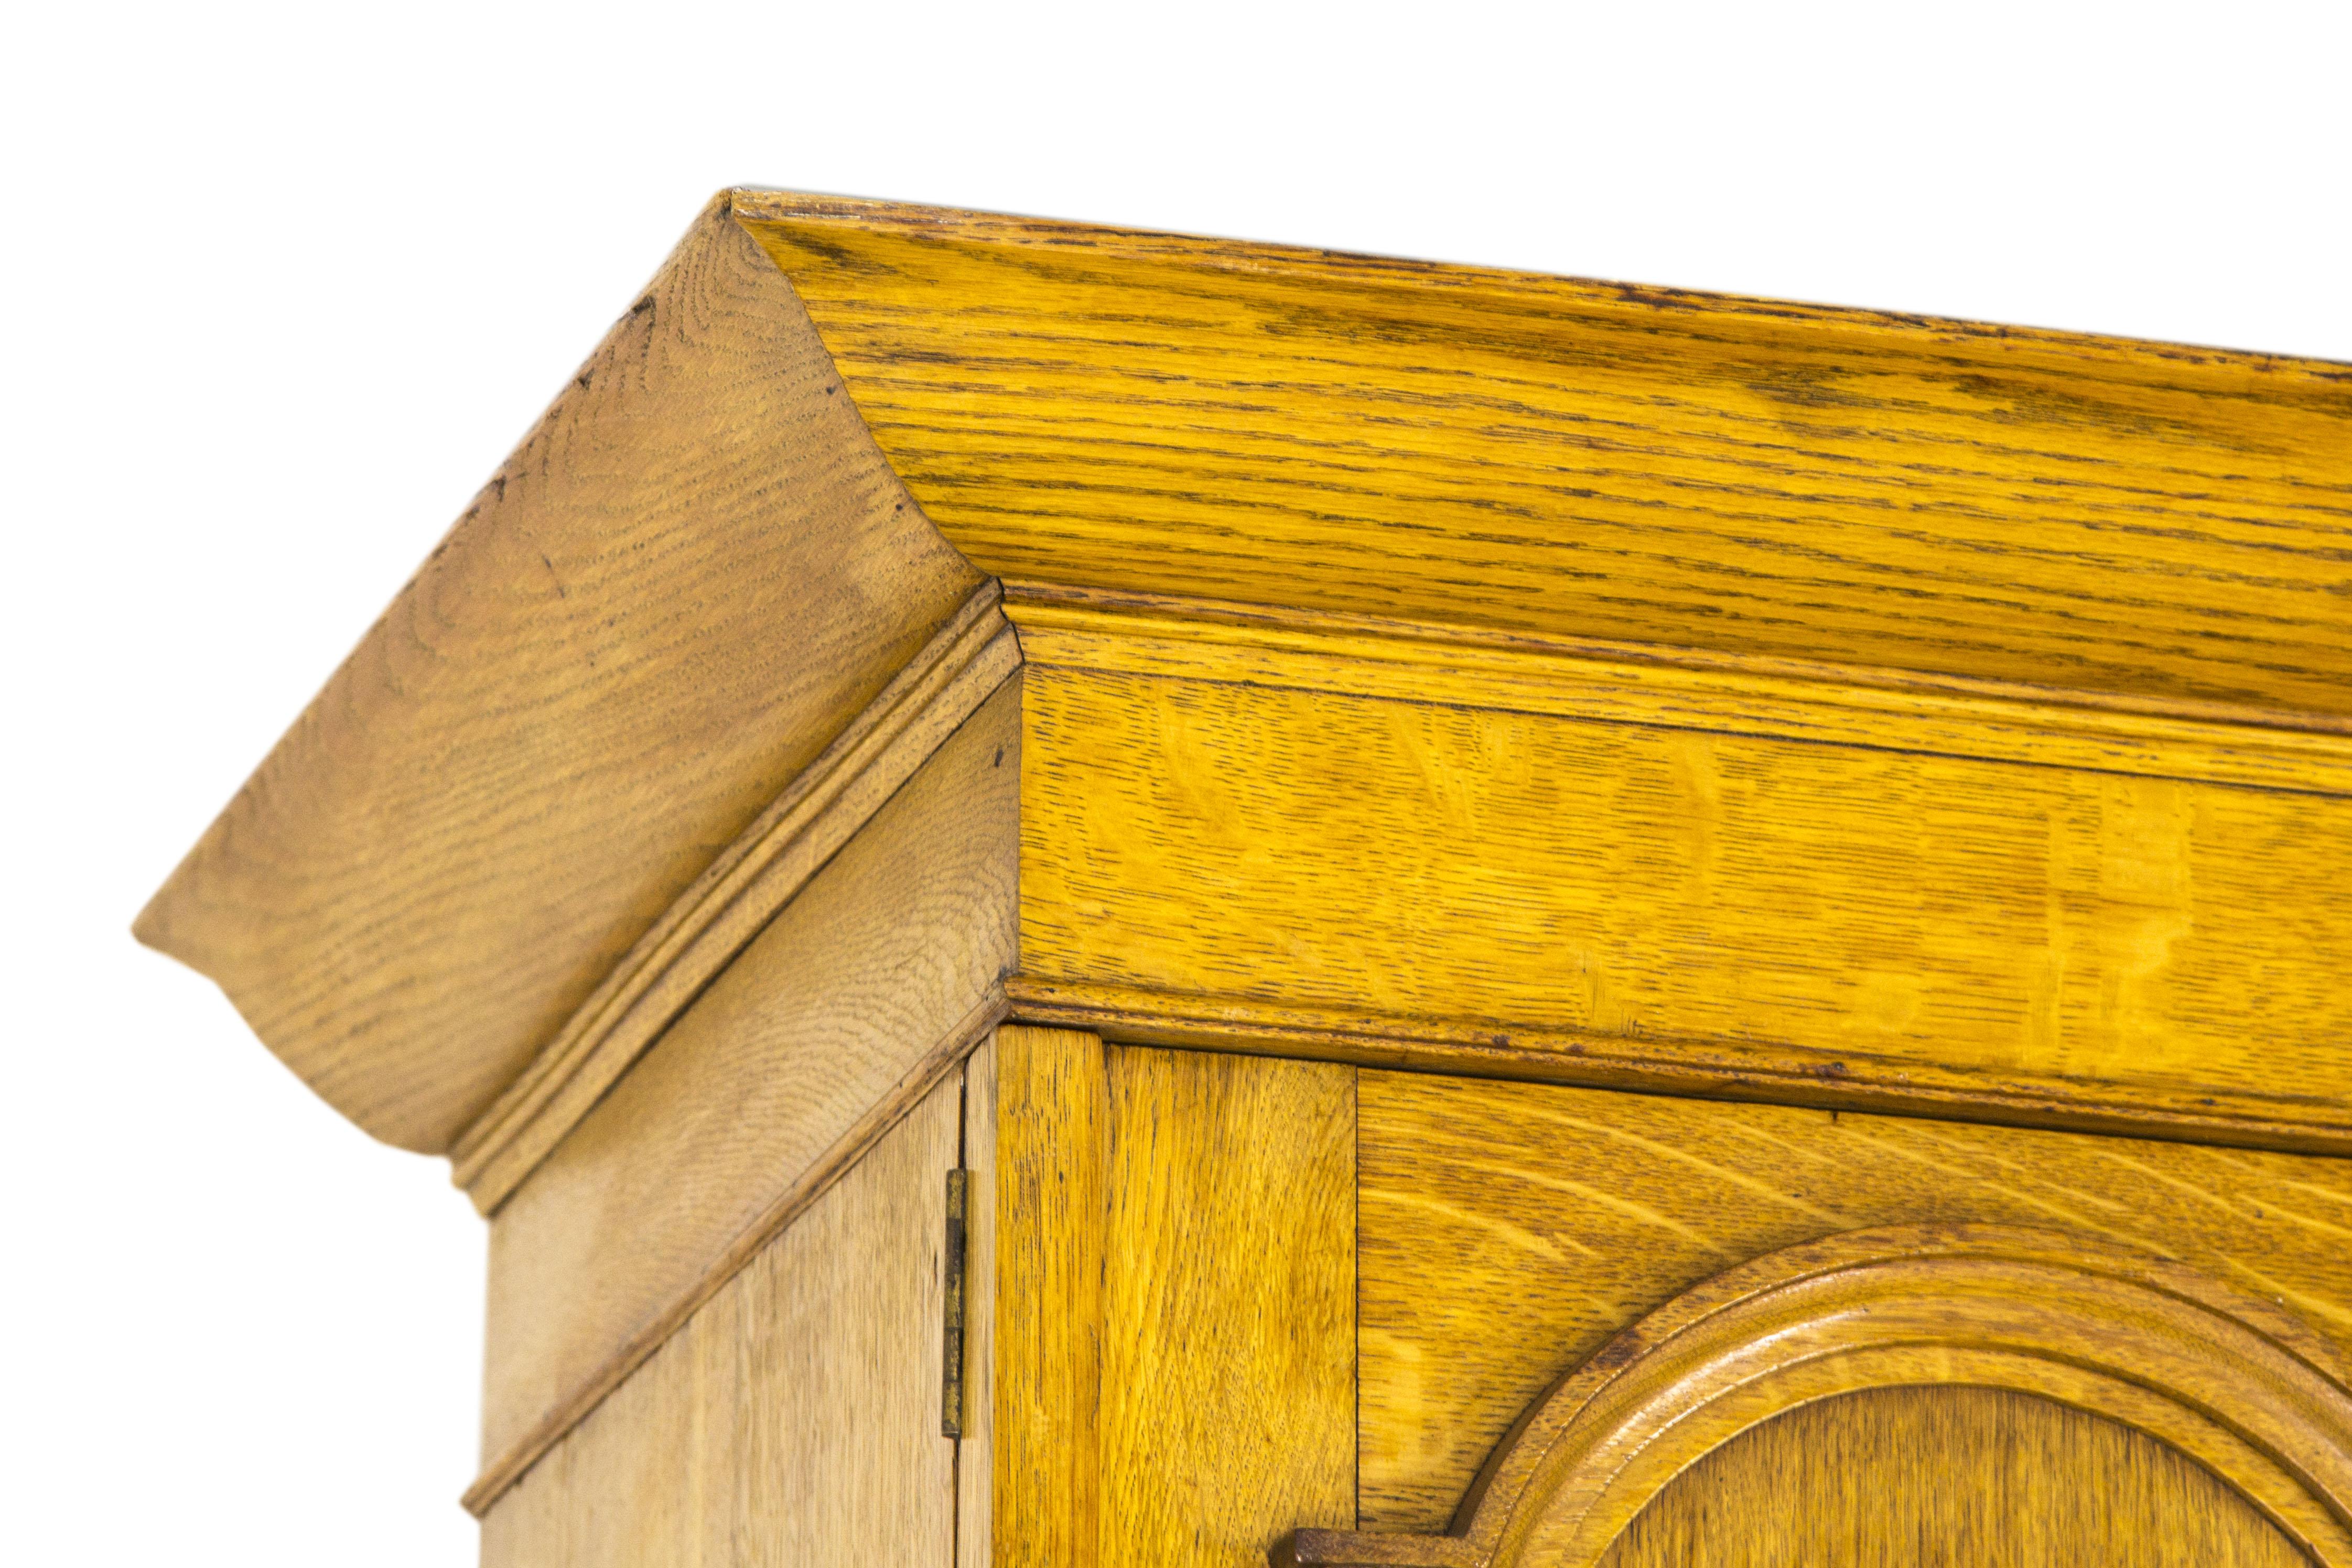 Antique Armoire | Antique Wardrobe | Art Nouveau | George Logan | Arts And  Crafts Wardrobe | B717